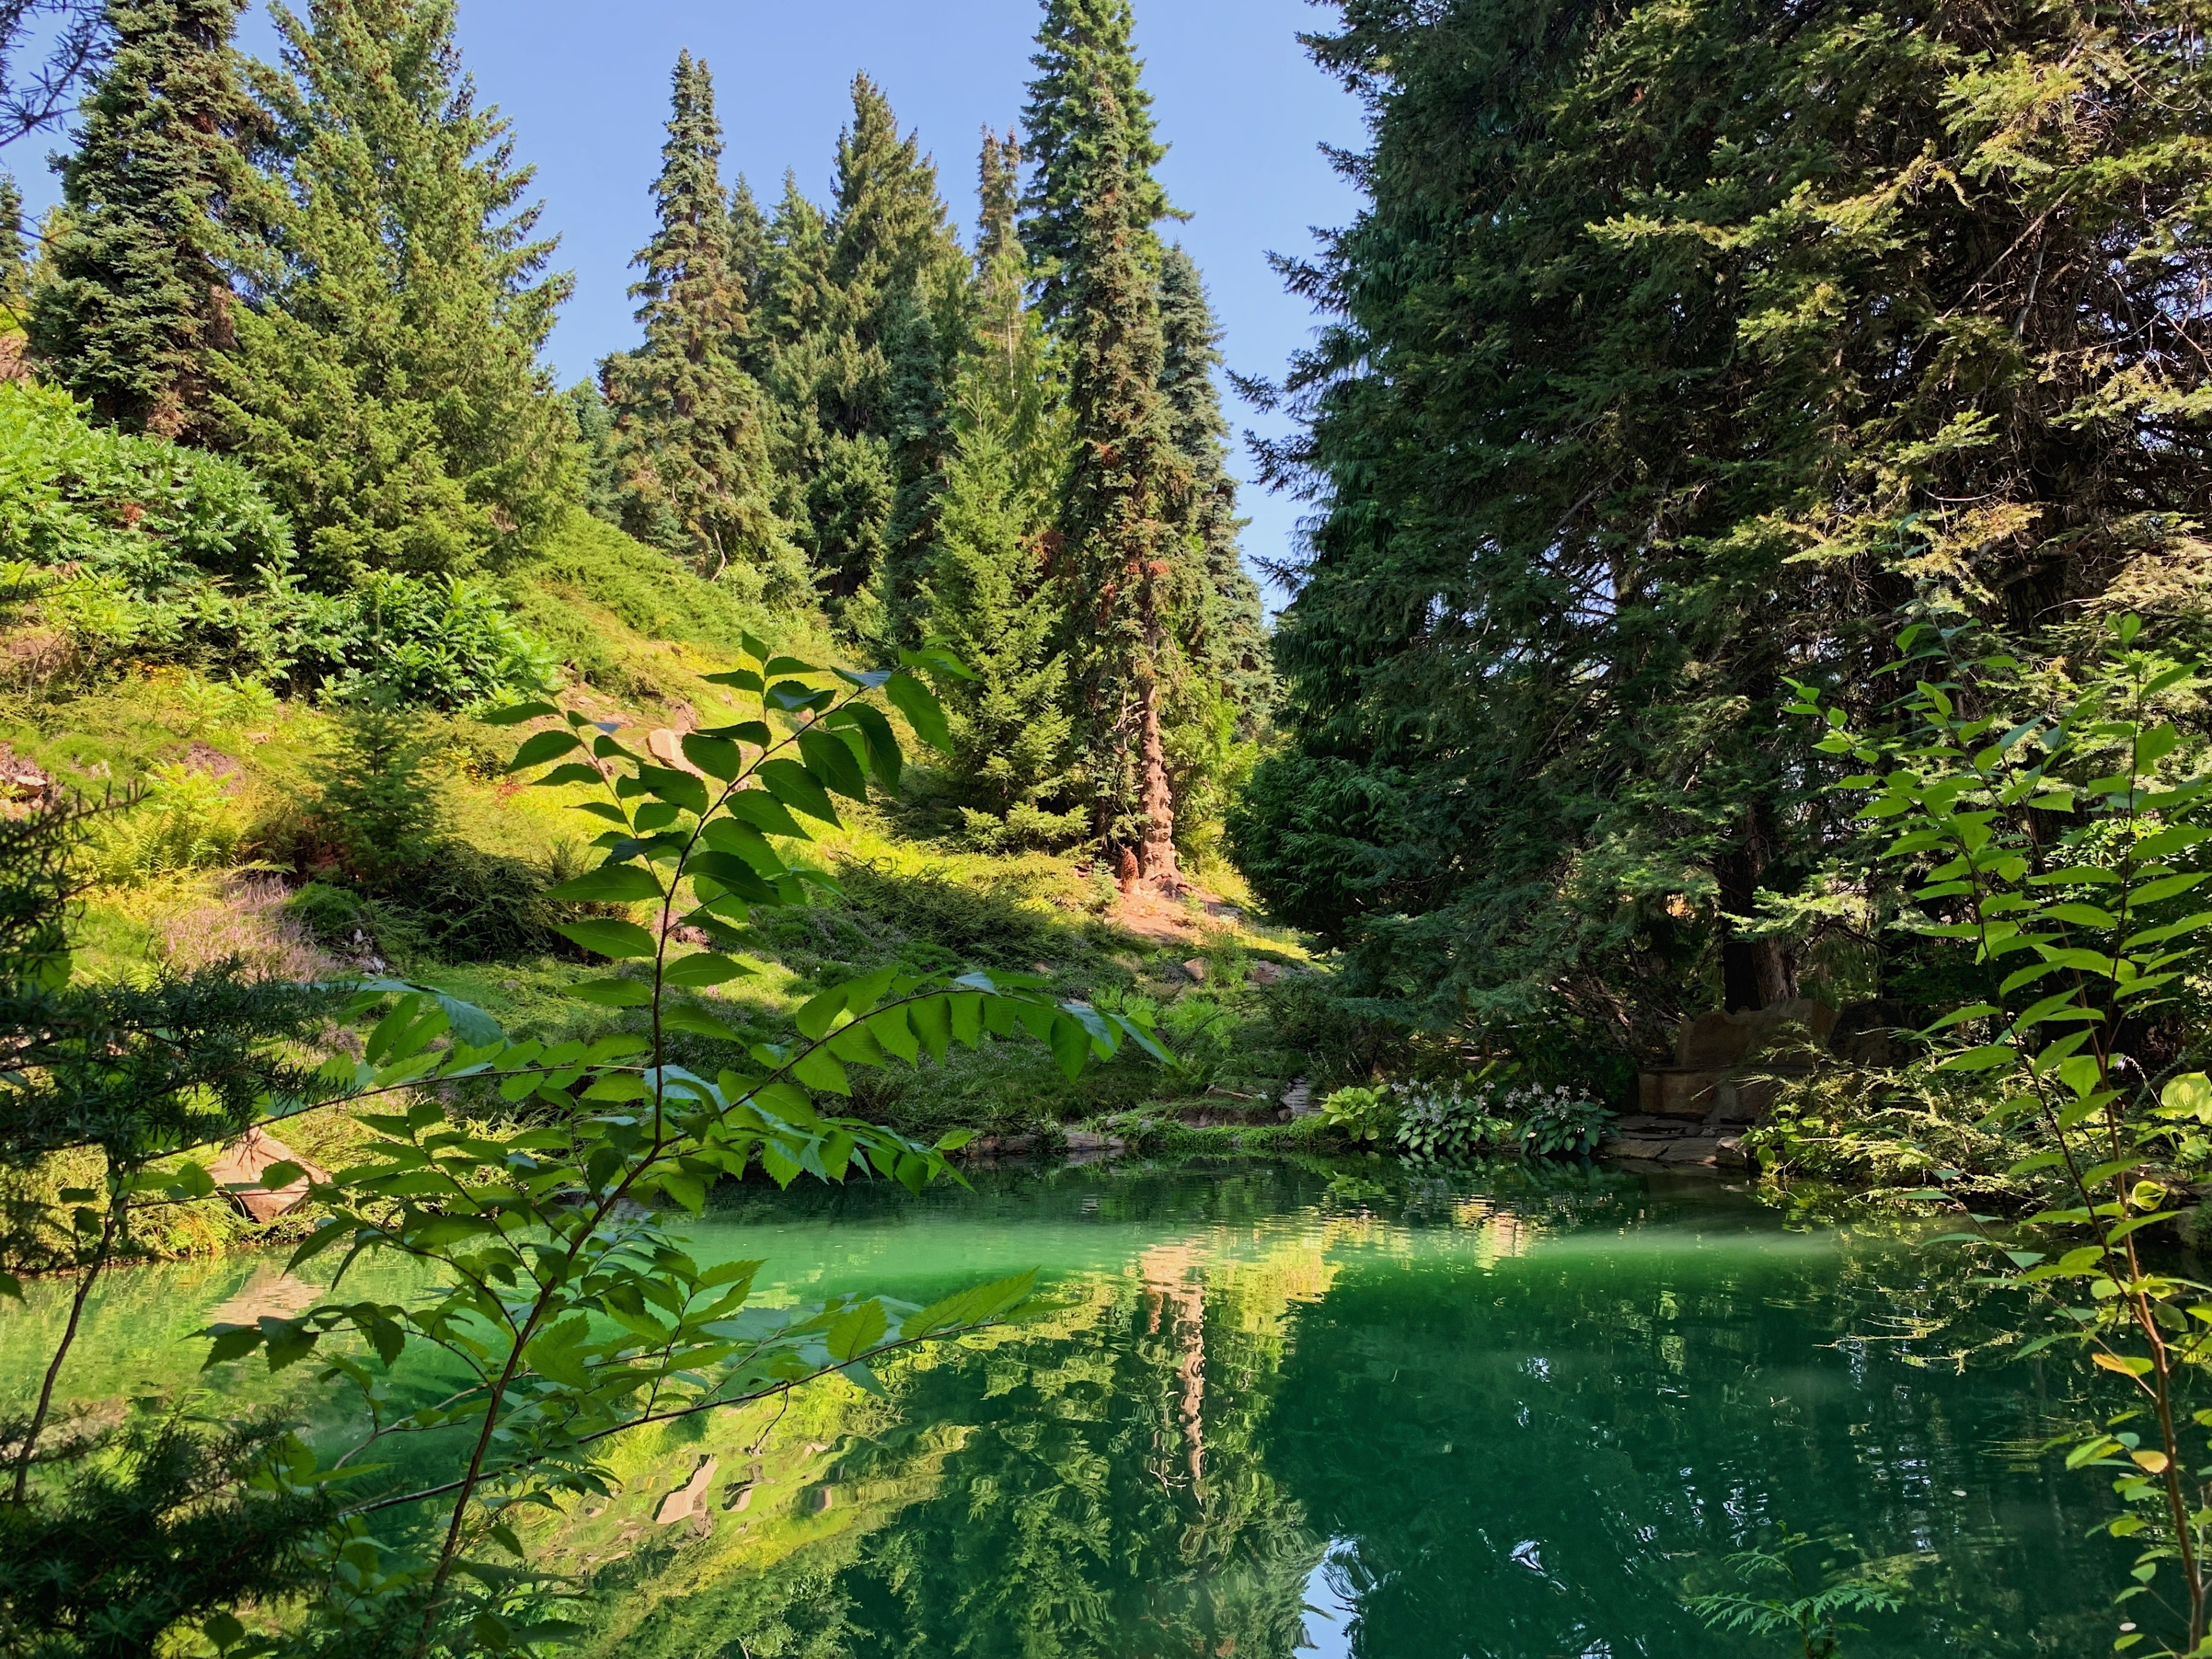 Ohme Gardens, Sunnyslope, Washington, USA